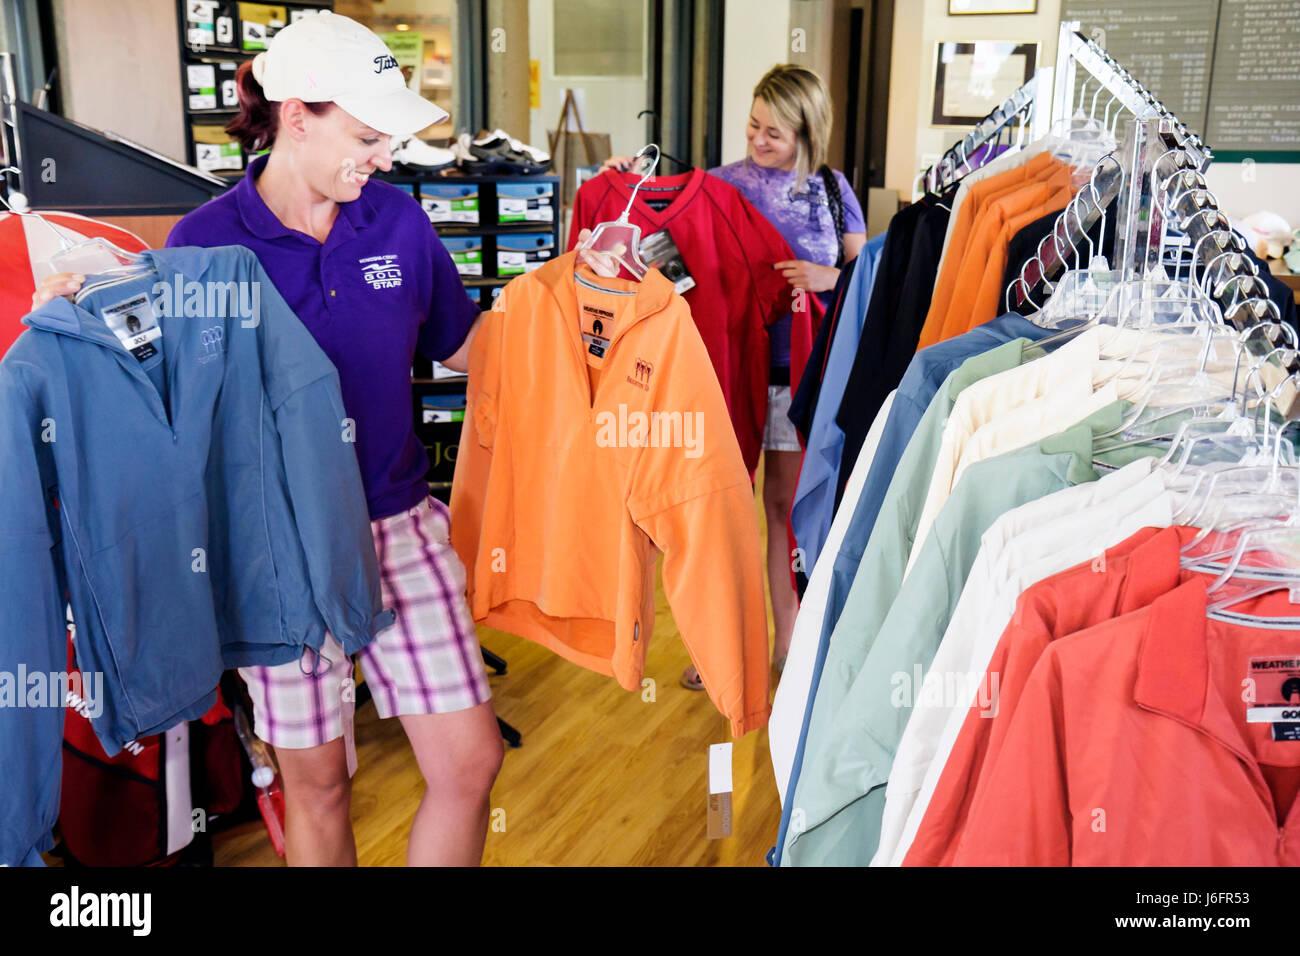 Wisconsin Kenosha Kansasville Brighton Dale Links golf course county park system Pro Shop sporting goods clothing - Stock Image